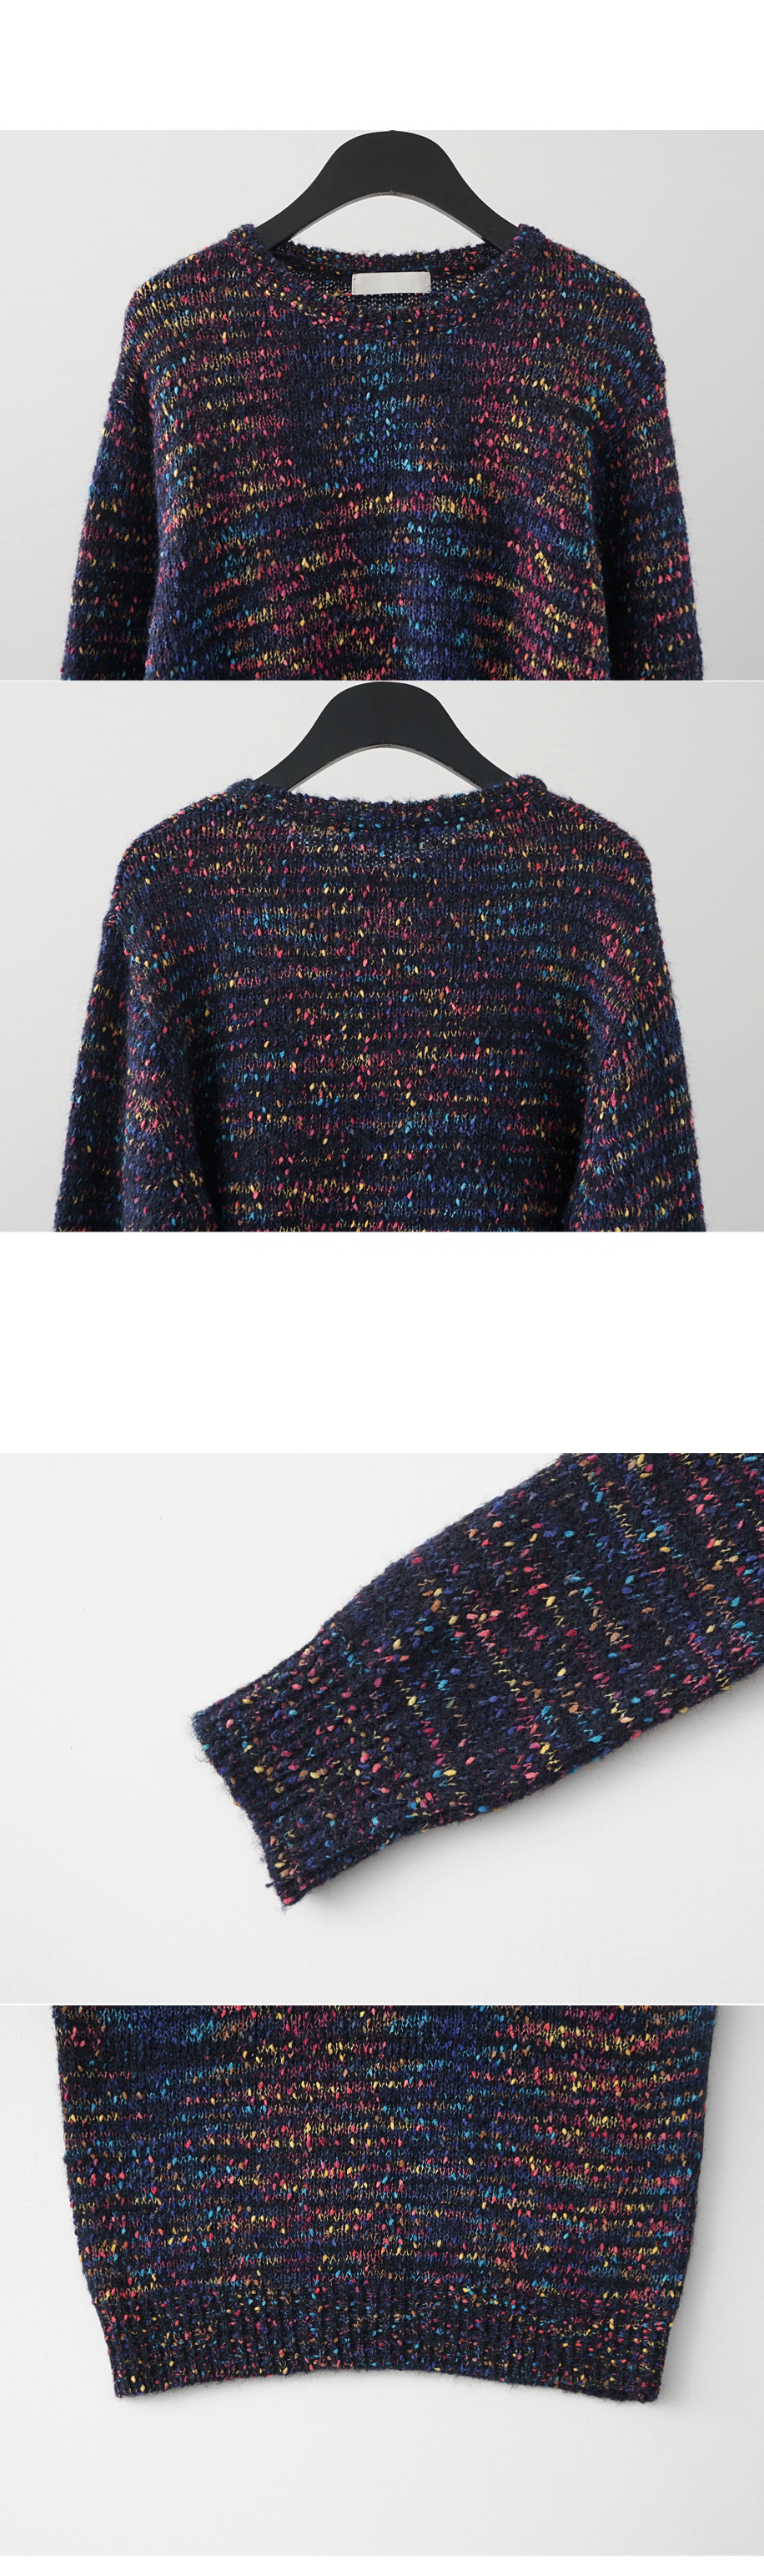 cotton candy mix knit